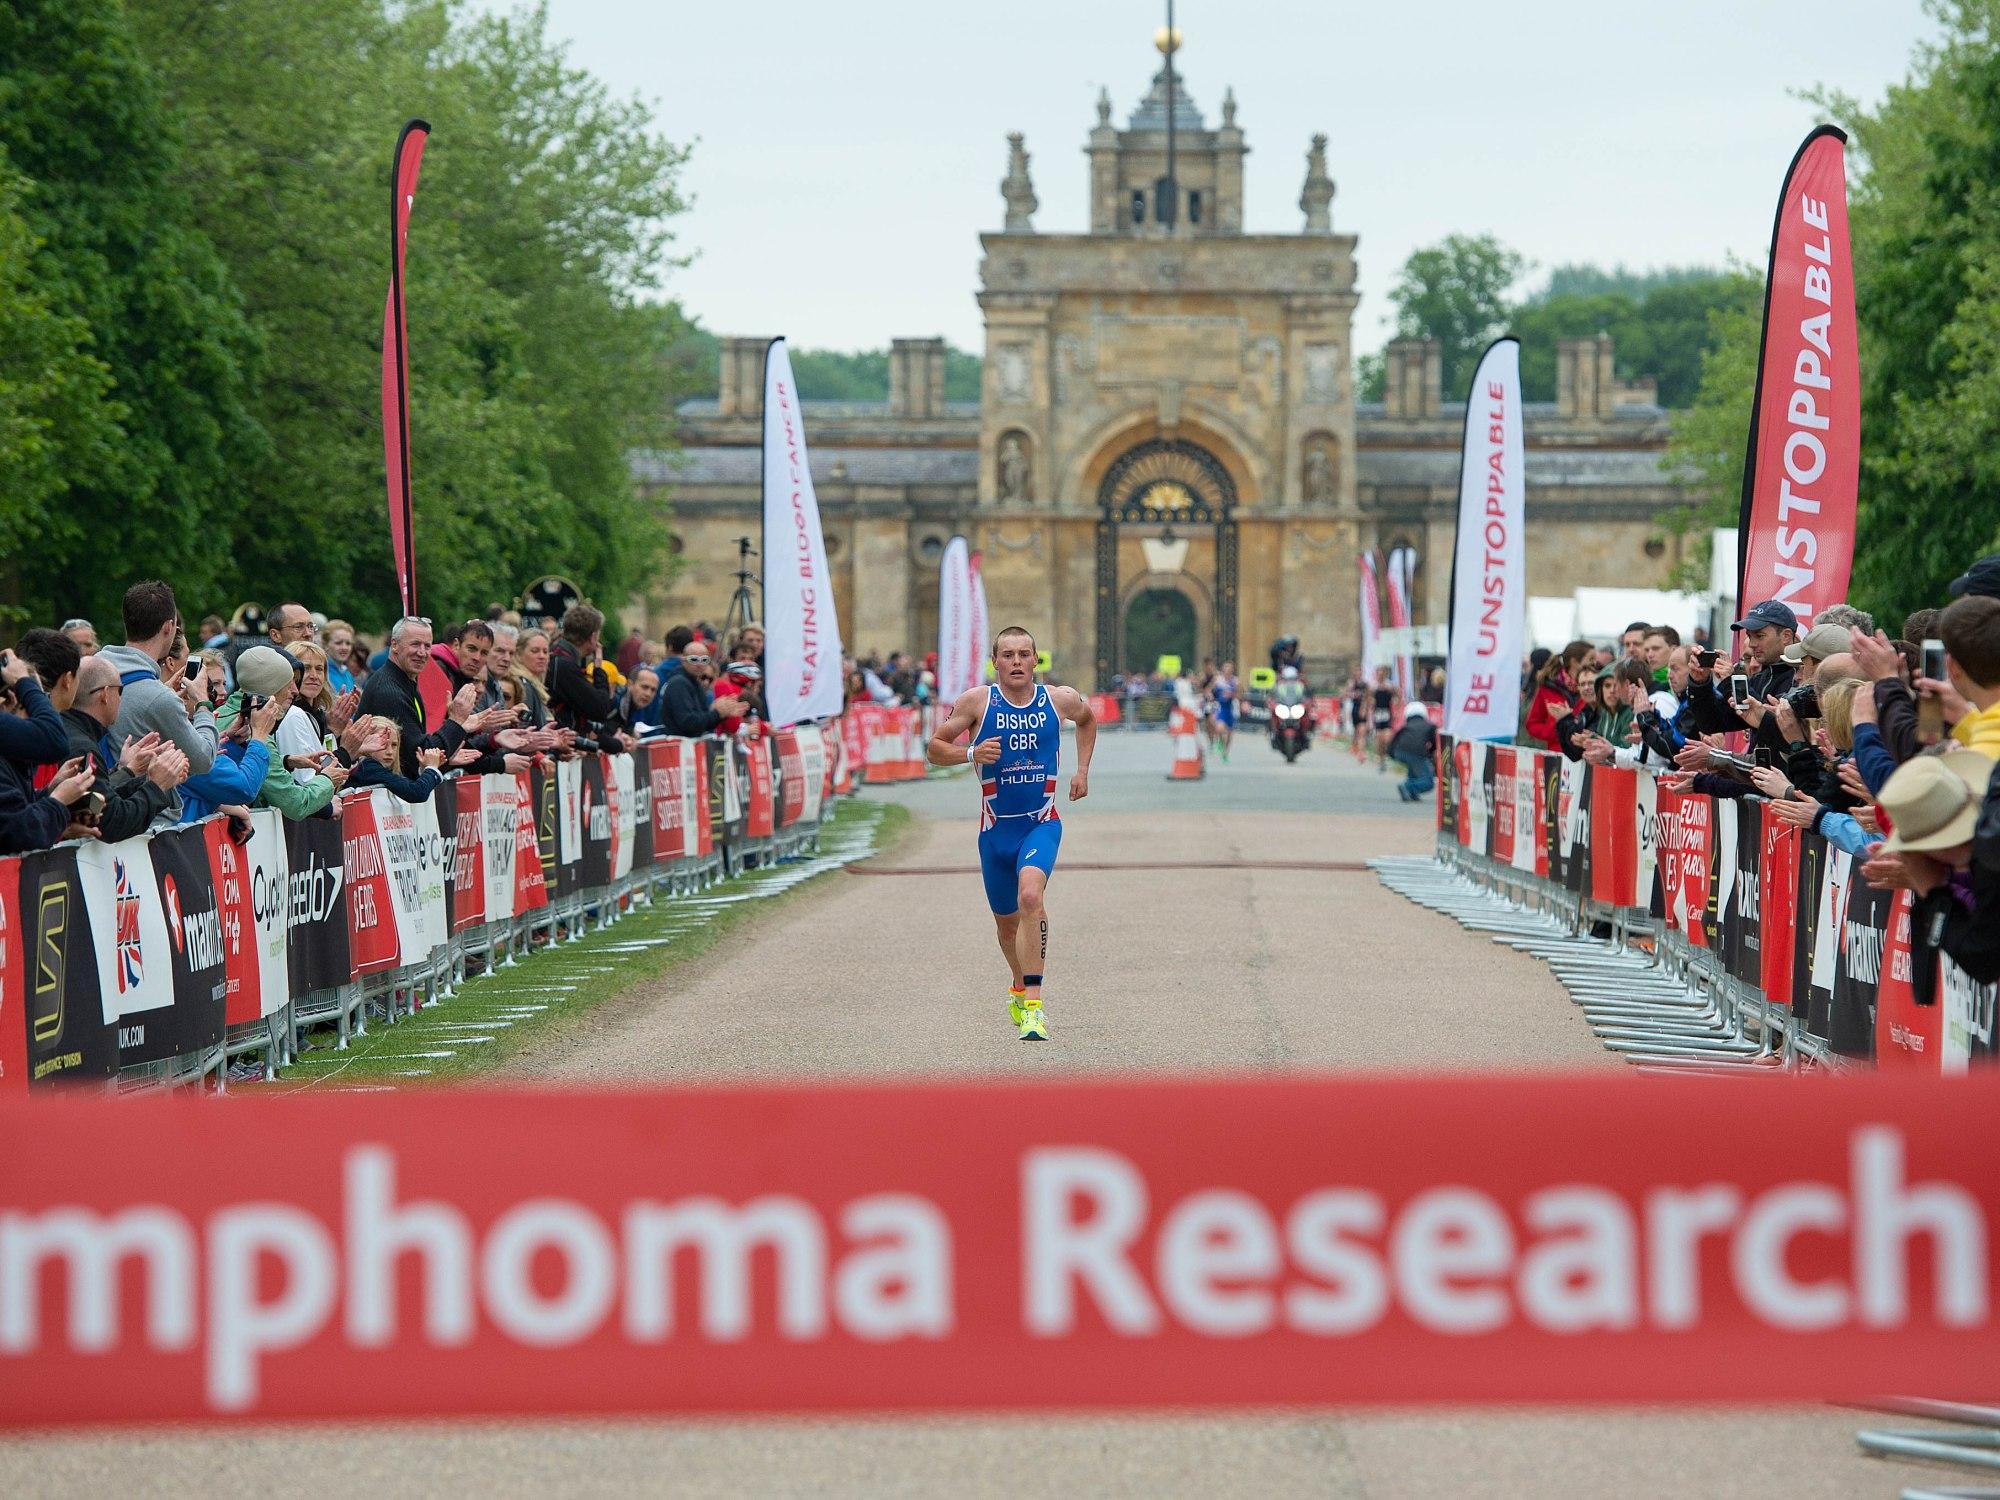 Blenheim palace triathlon 2015